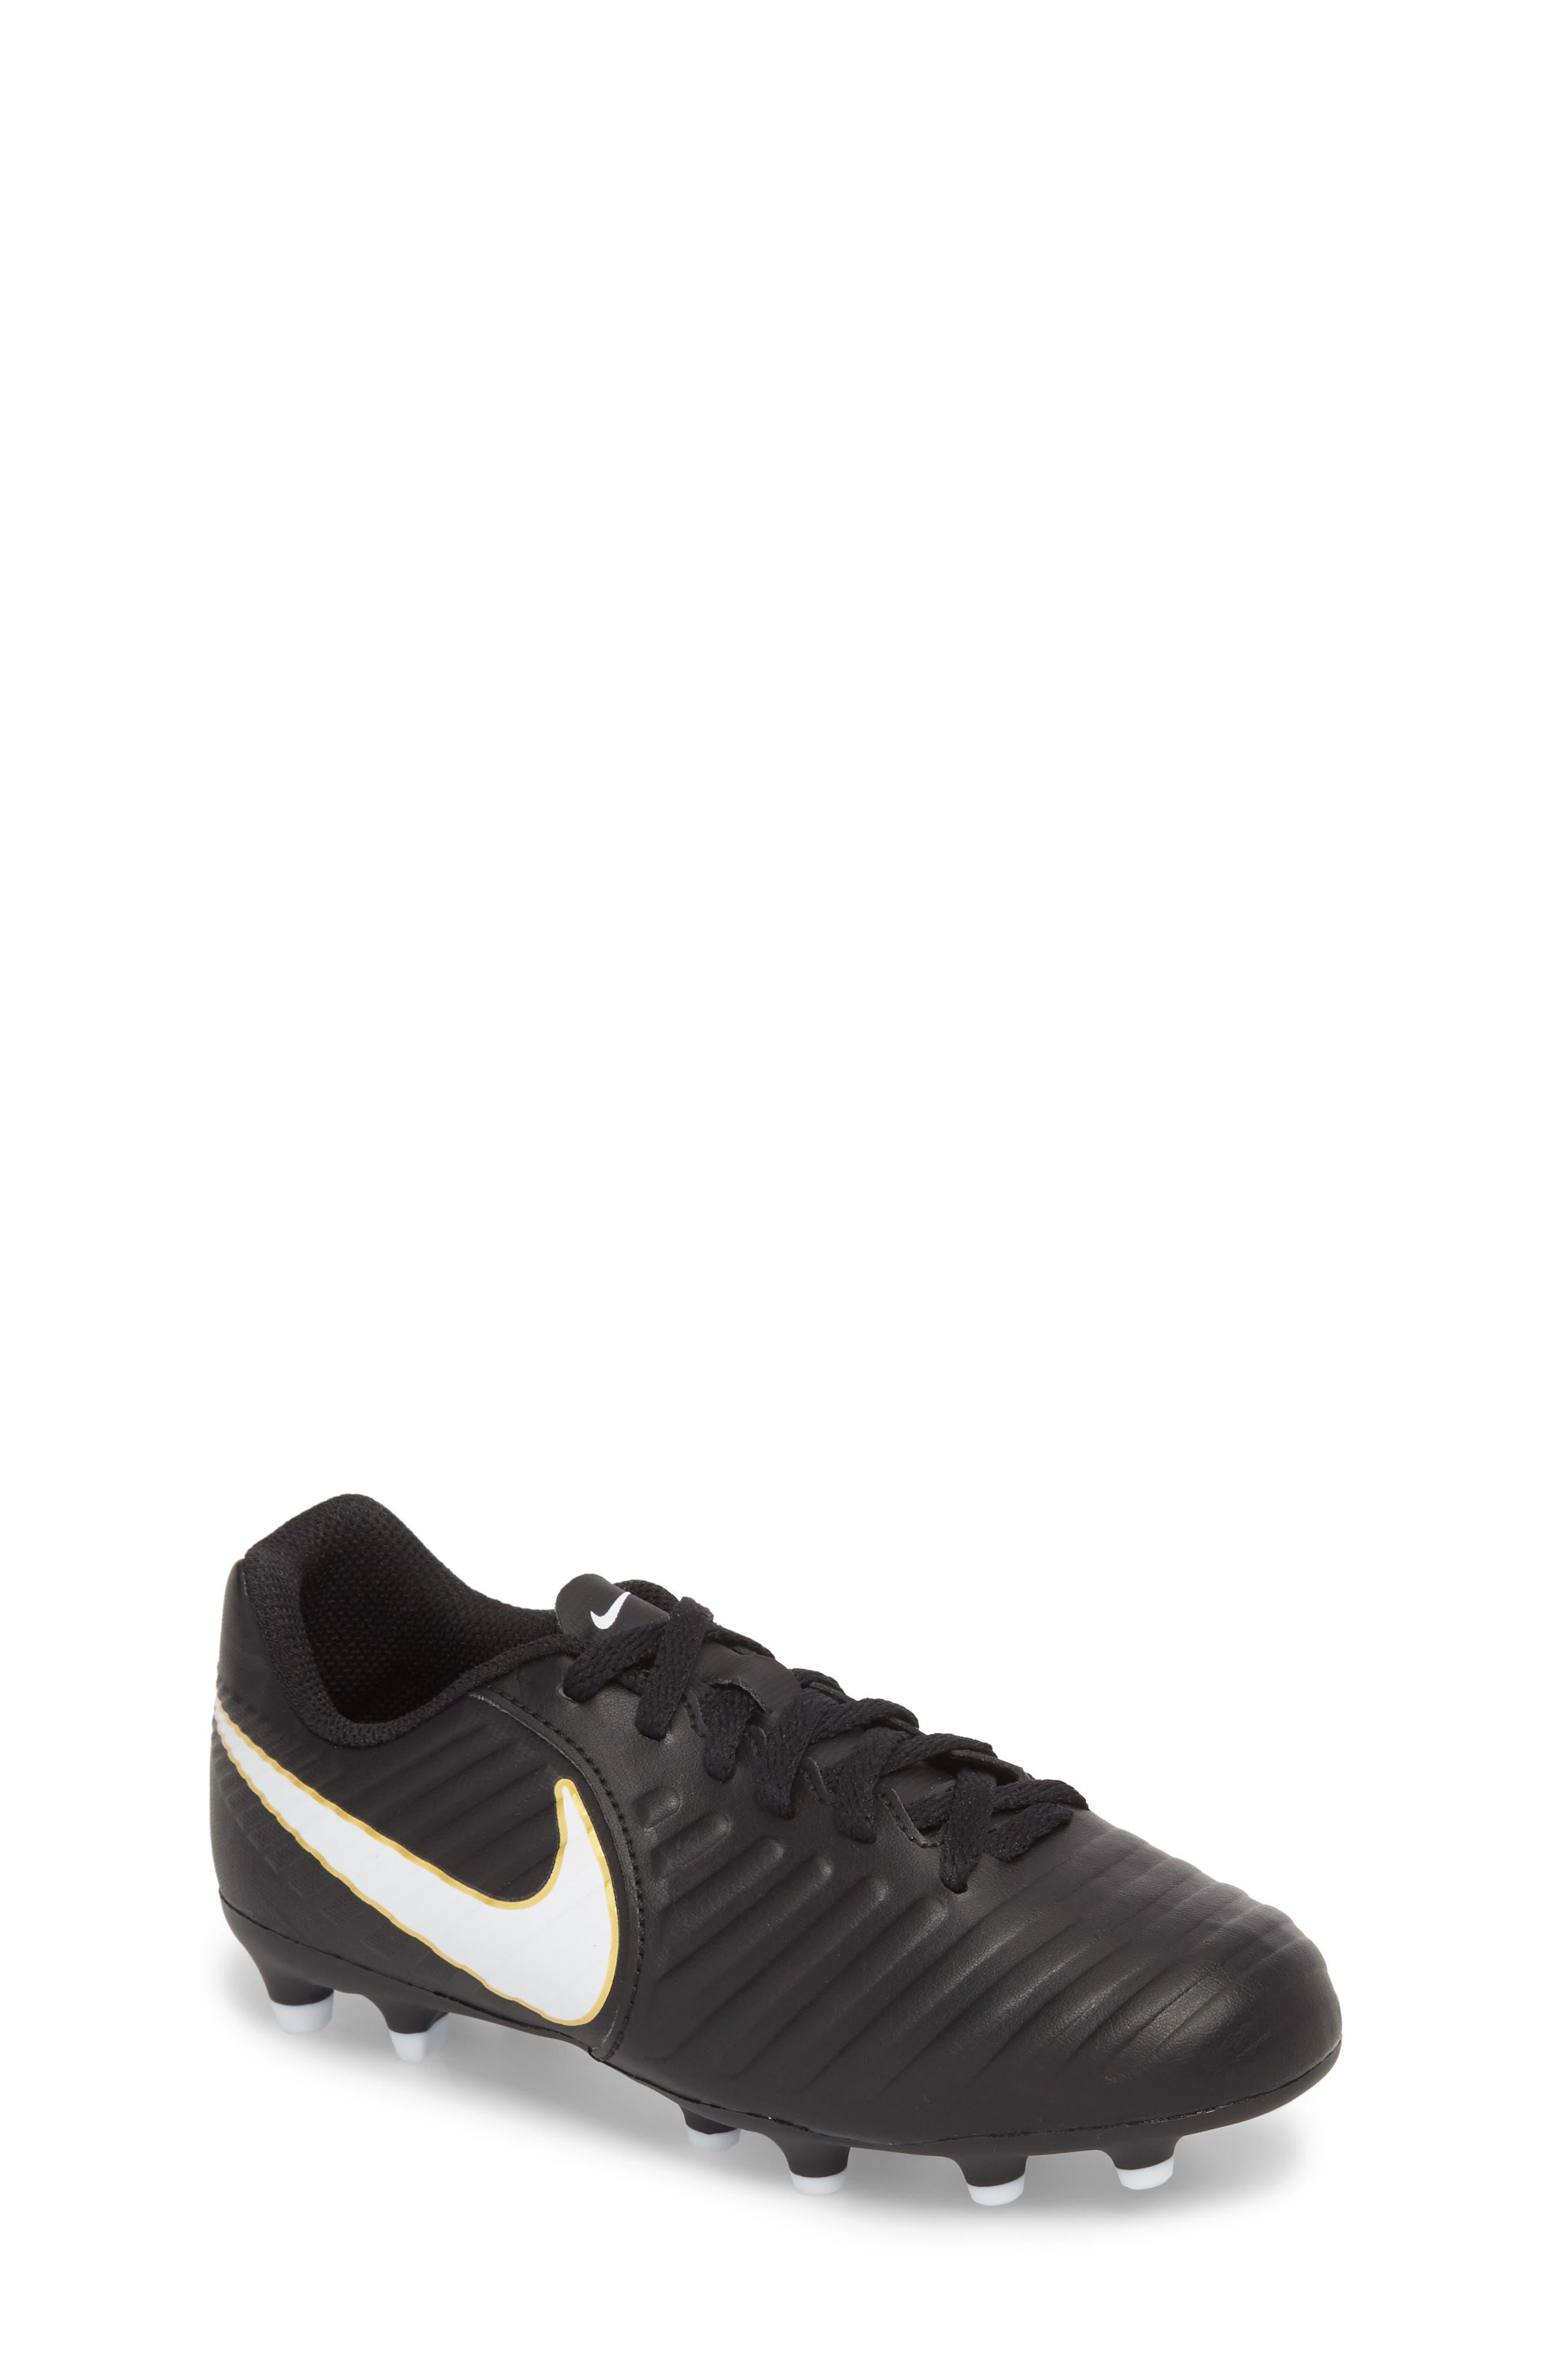 Tiempo Legend 7 Club Firm Ground Soccer Shoe,                             Main thumbnail 1, color,                             002